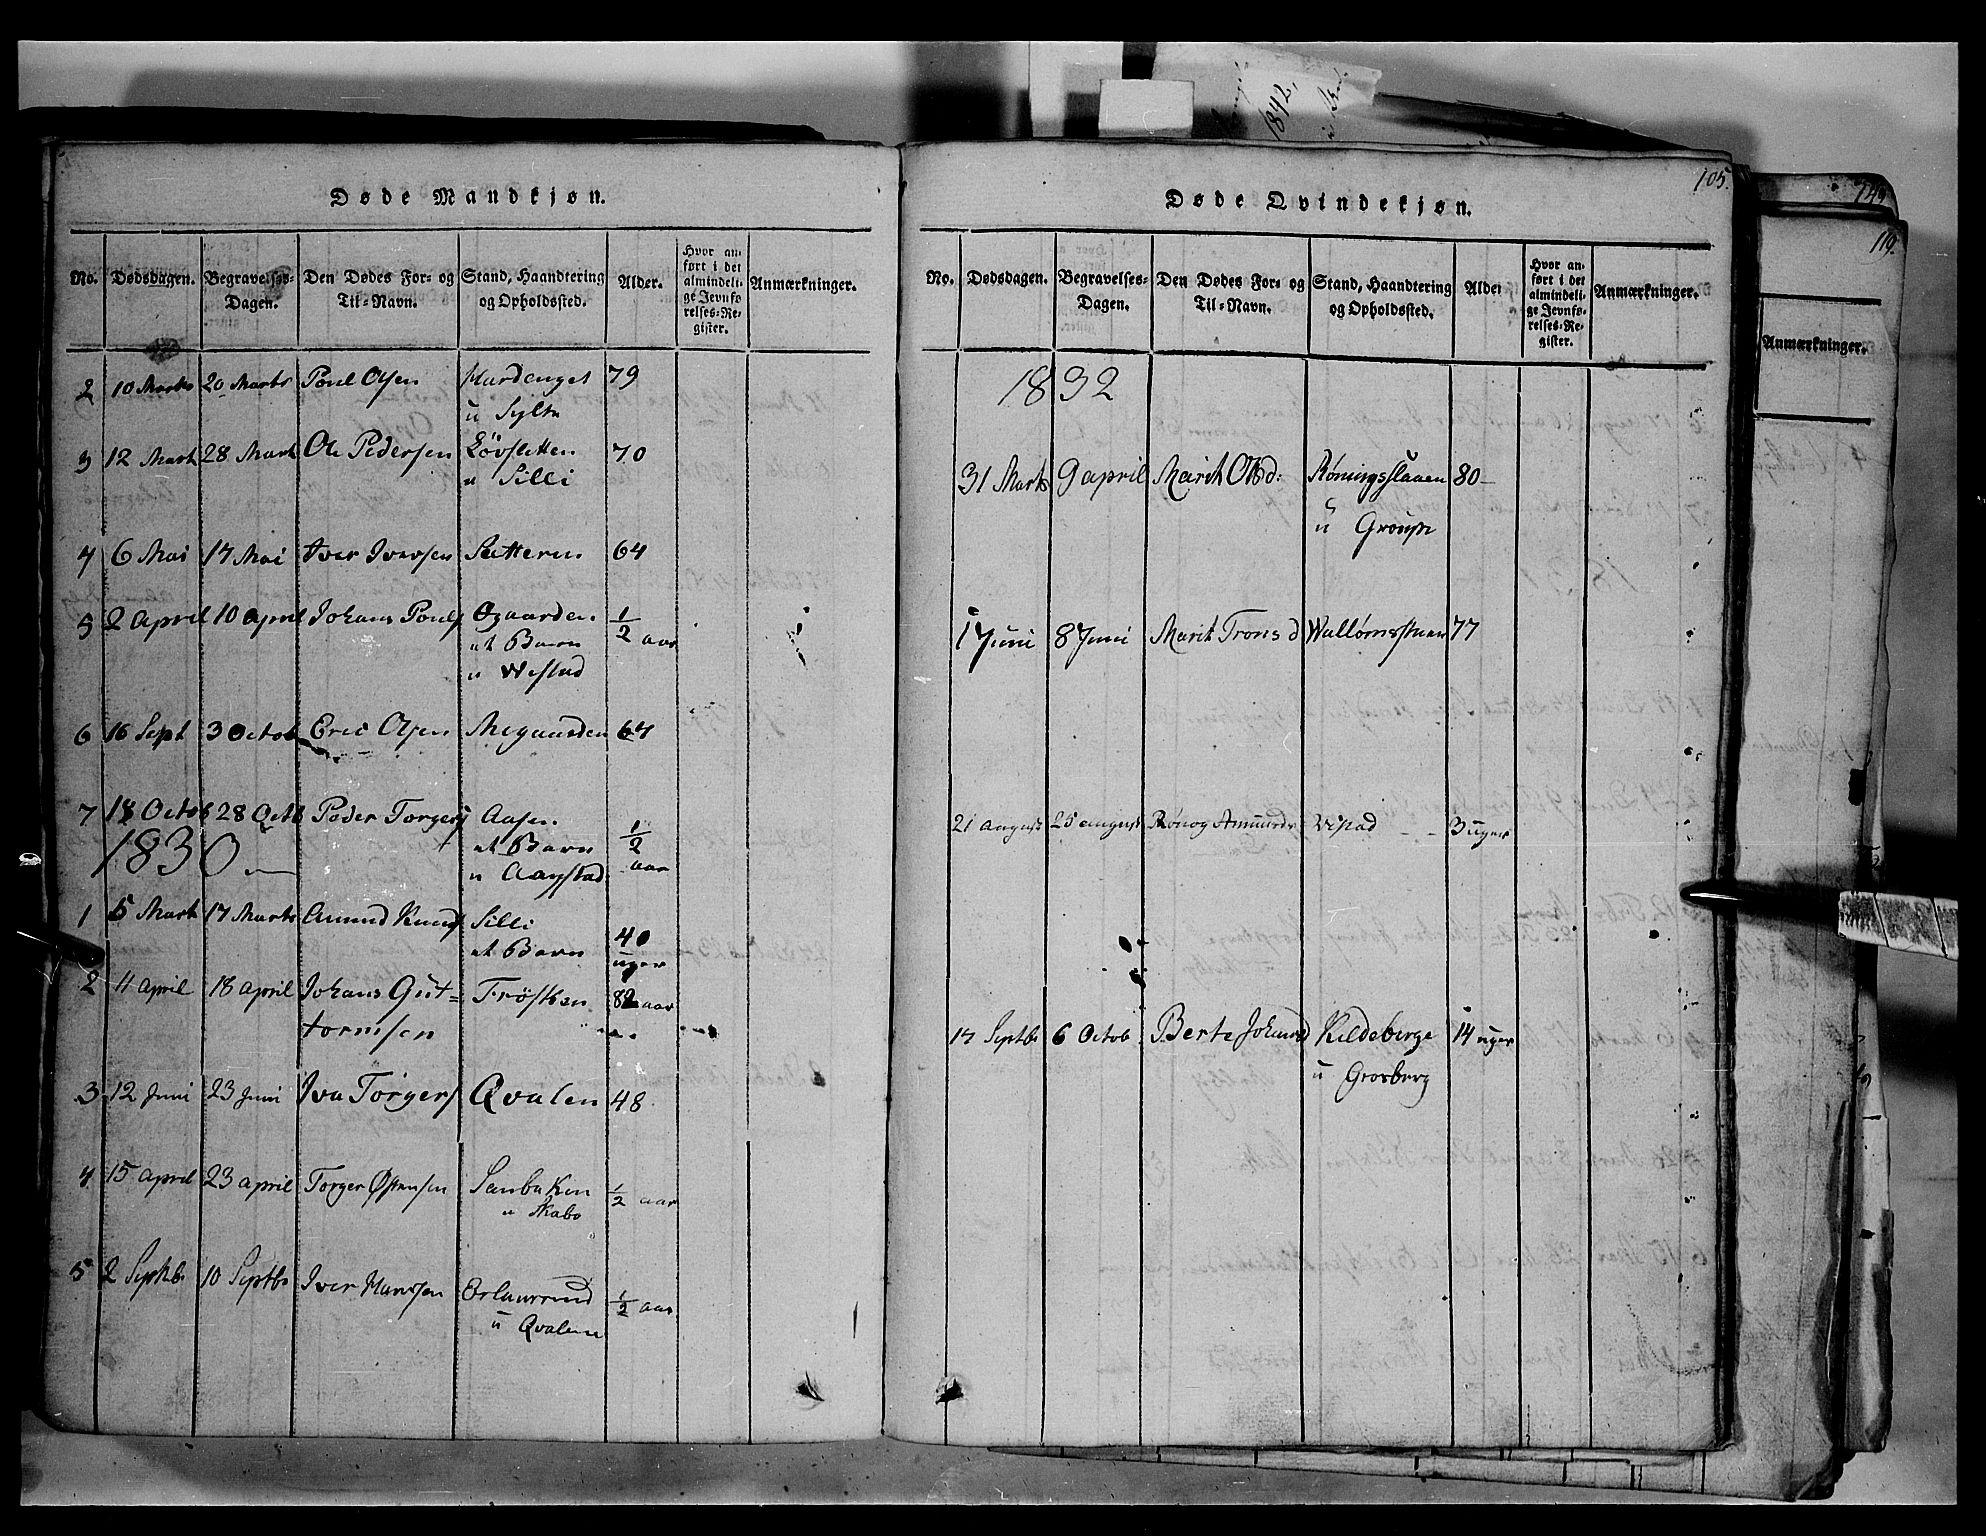 SAH, Fron prestekontor, H/Ha/Hab/L0003: Klokkerbok nr. 3, 1816-1850, s. 105